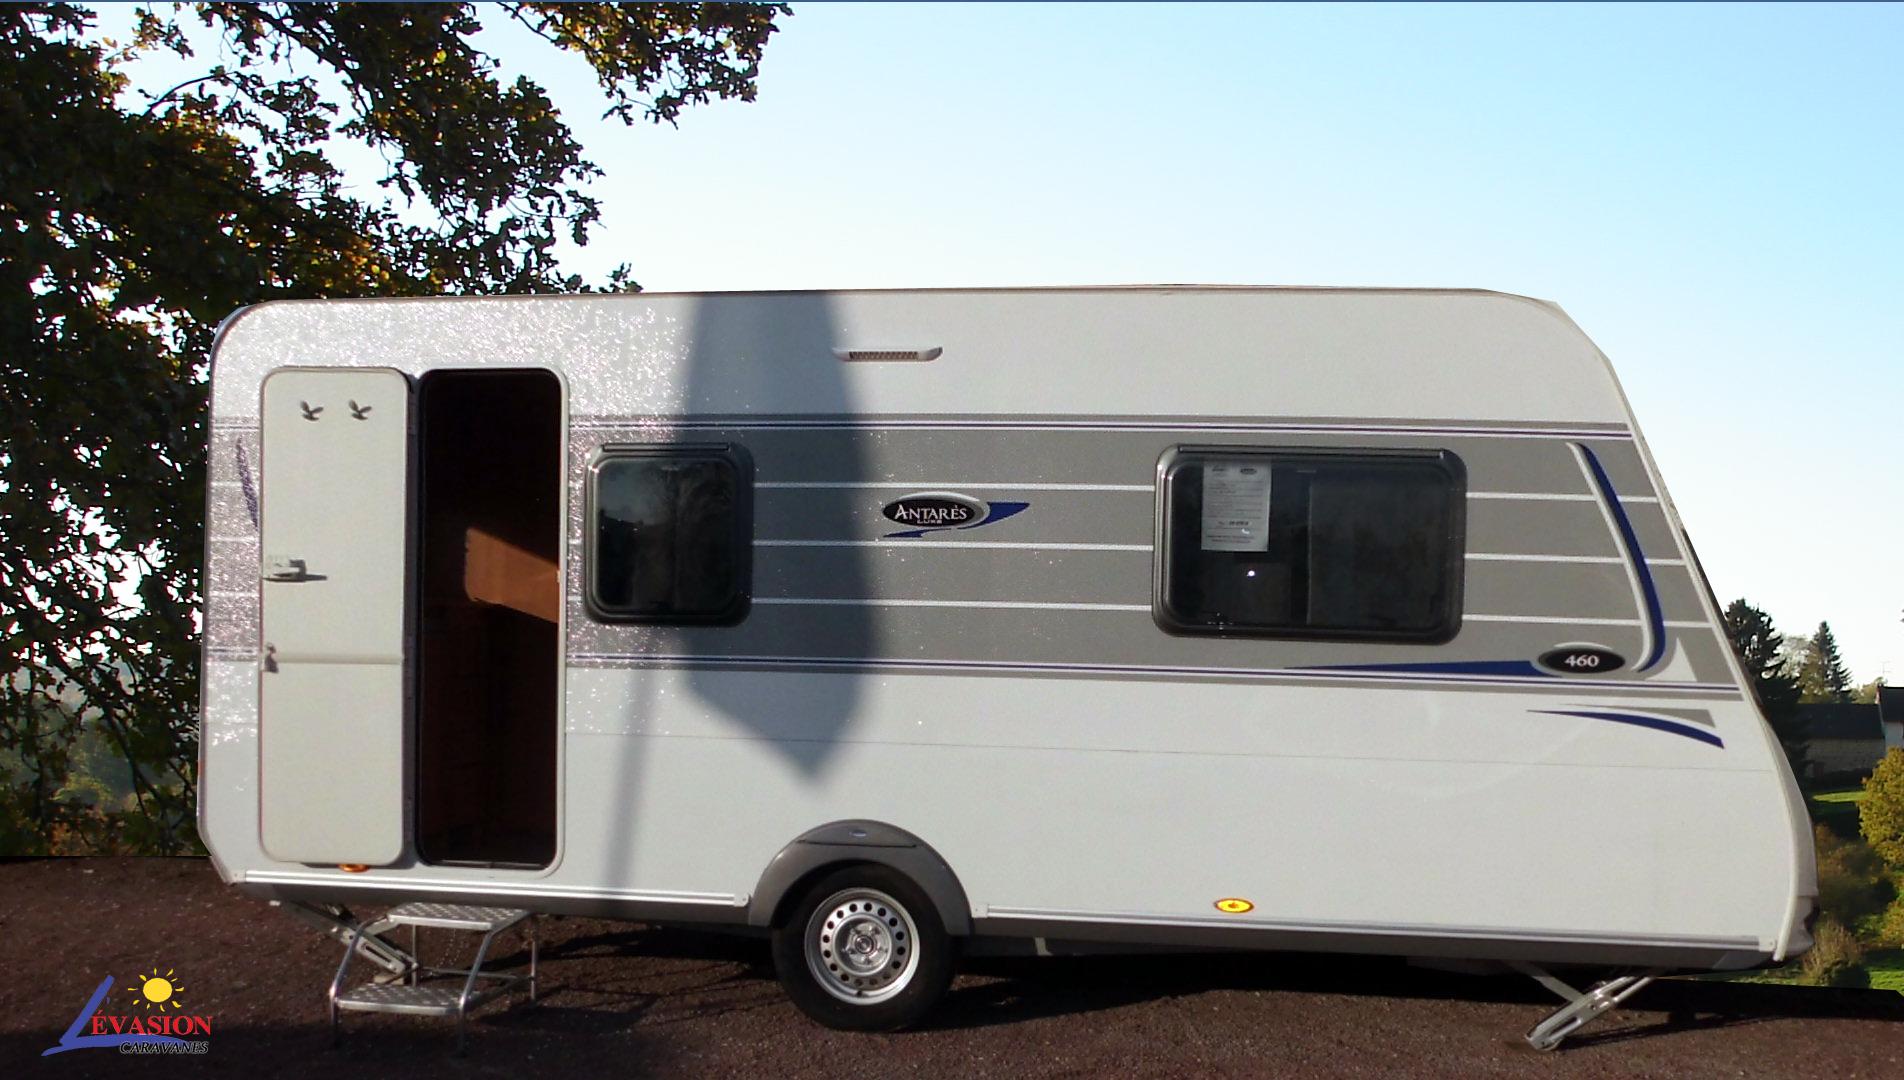 caravane caravelair antares luxe 460 mod le 2013 gironde le blog du camping car. Black Bedroom Furniture Sets. Home Design Ideas